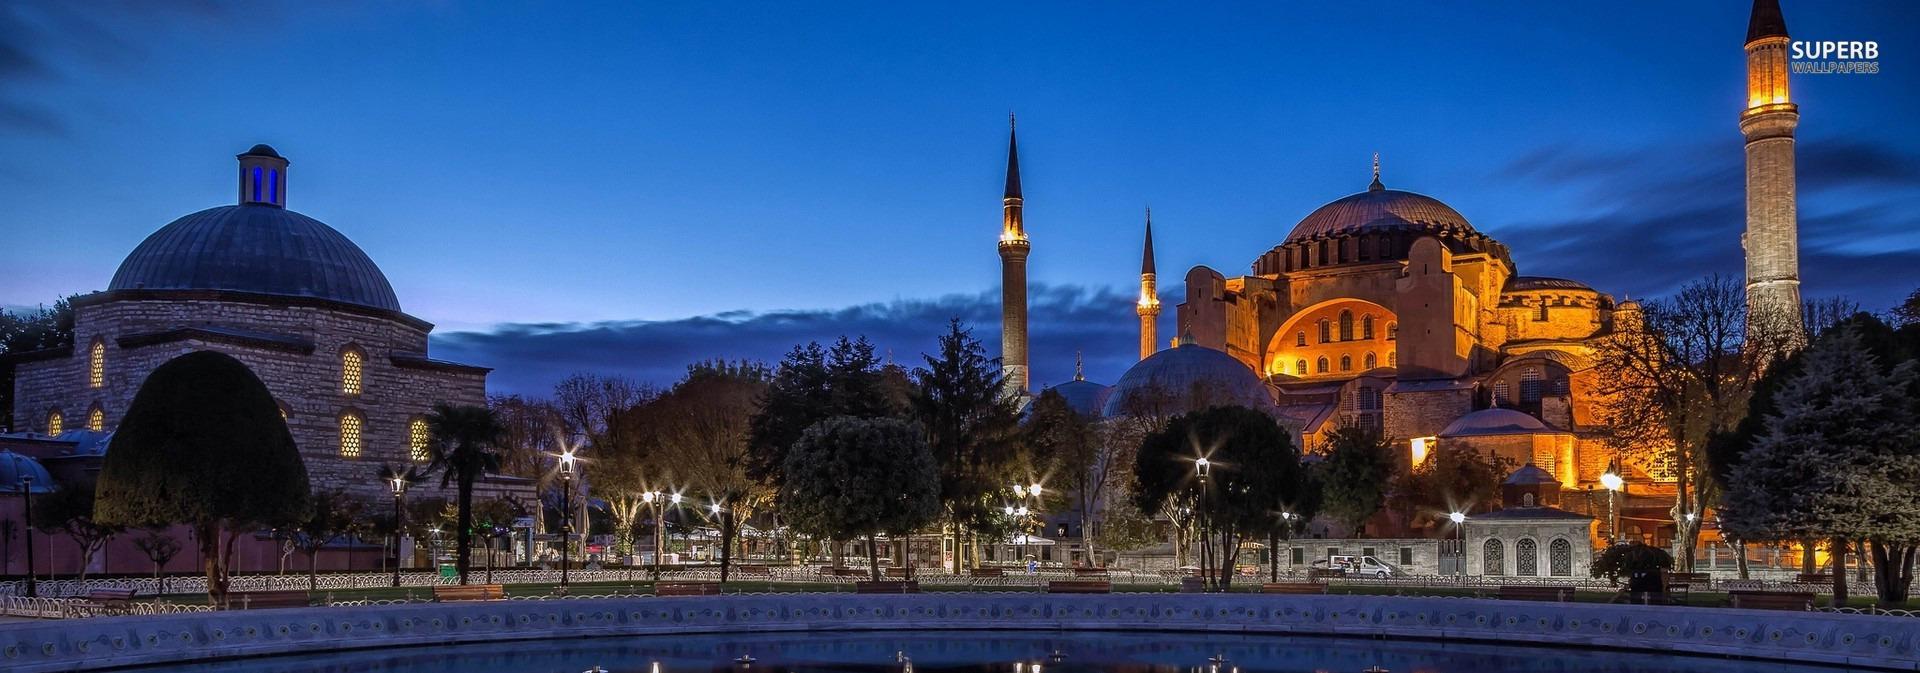 ISTANBUL NOVA GODINA 2018 BUS